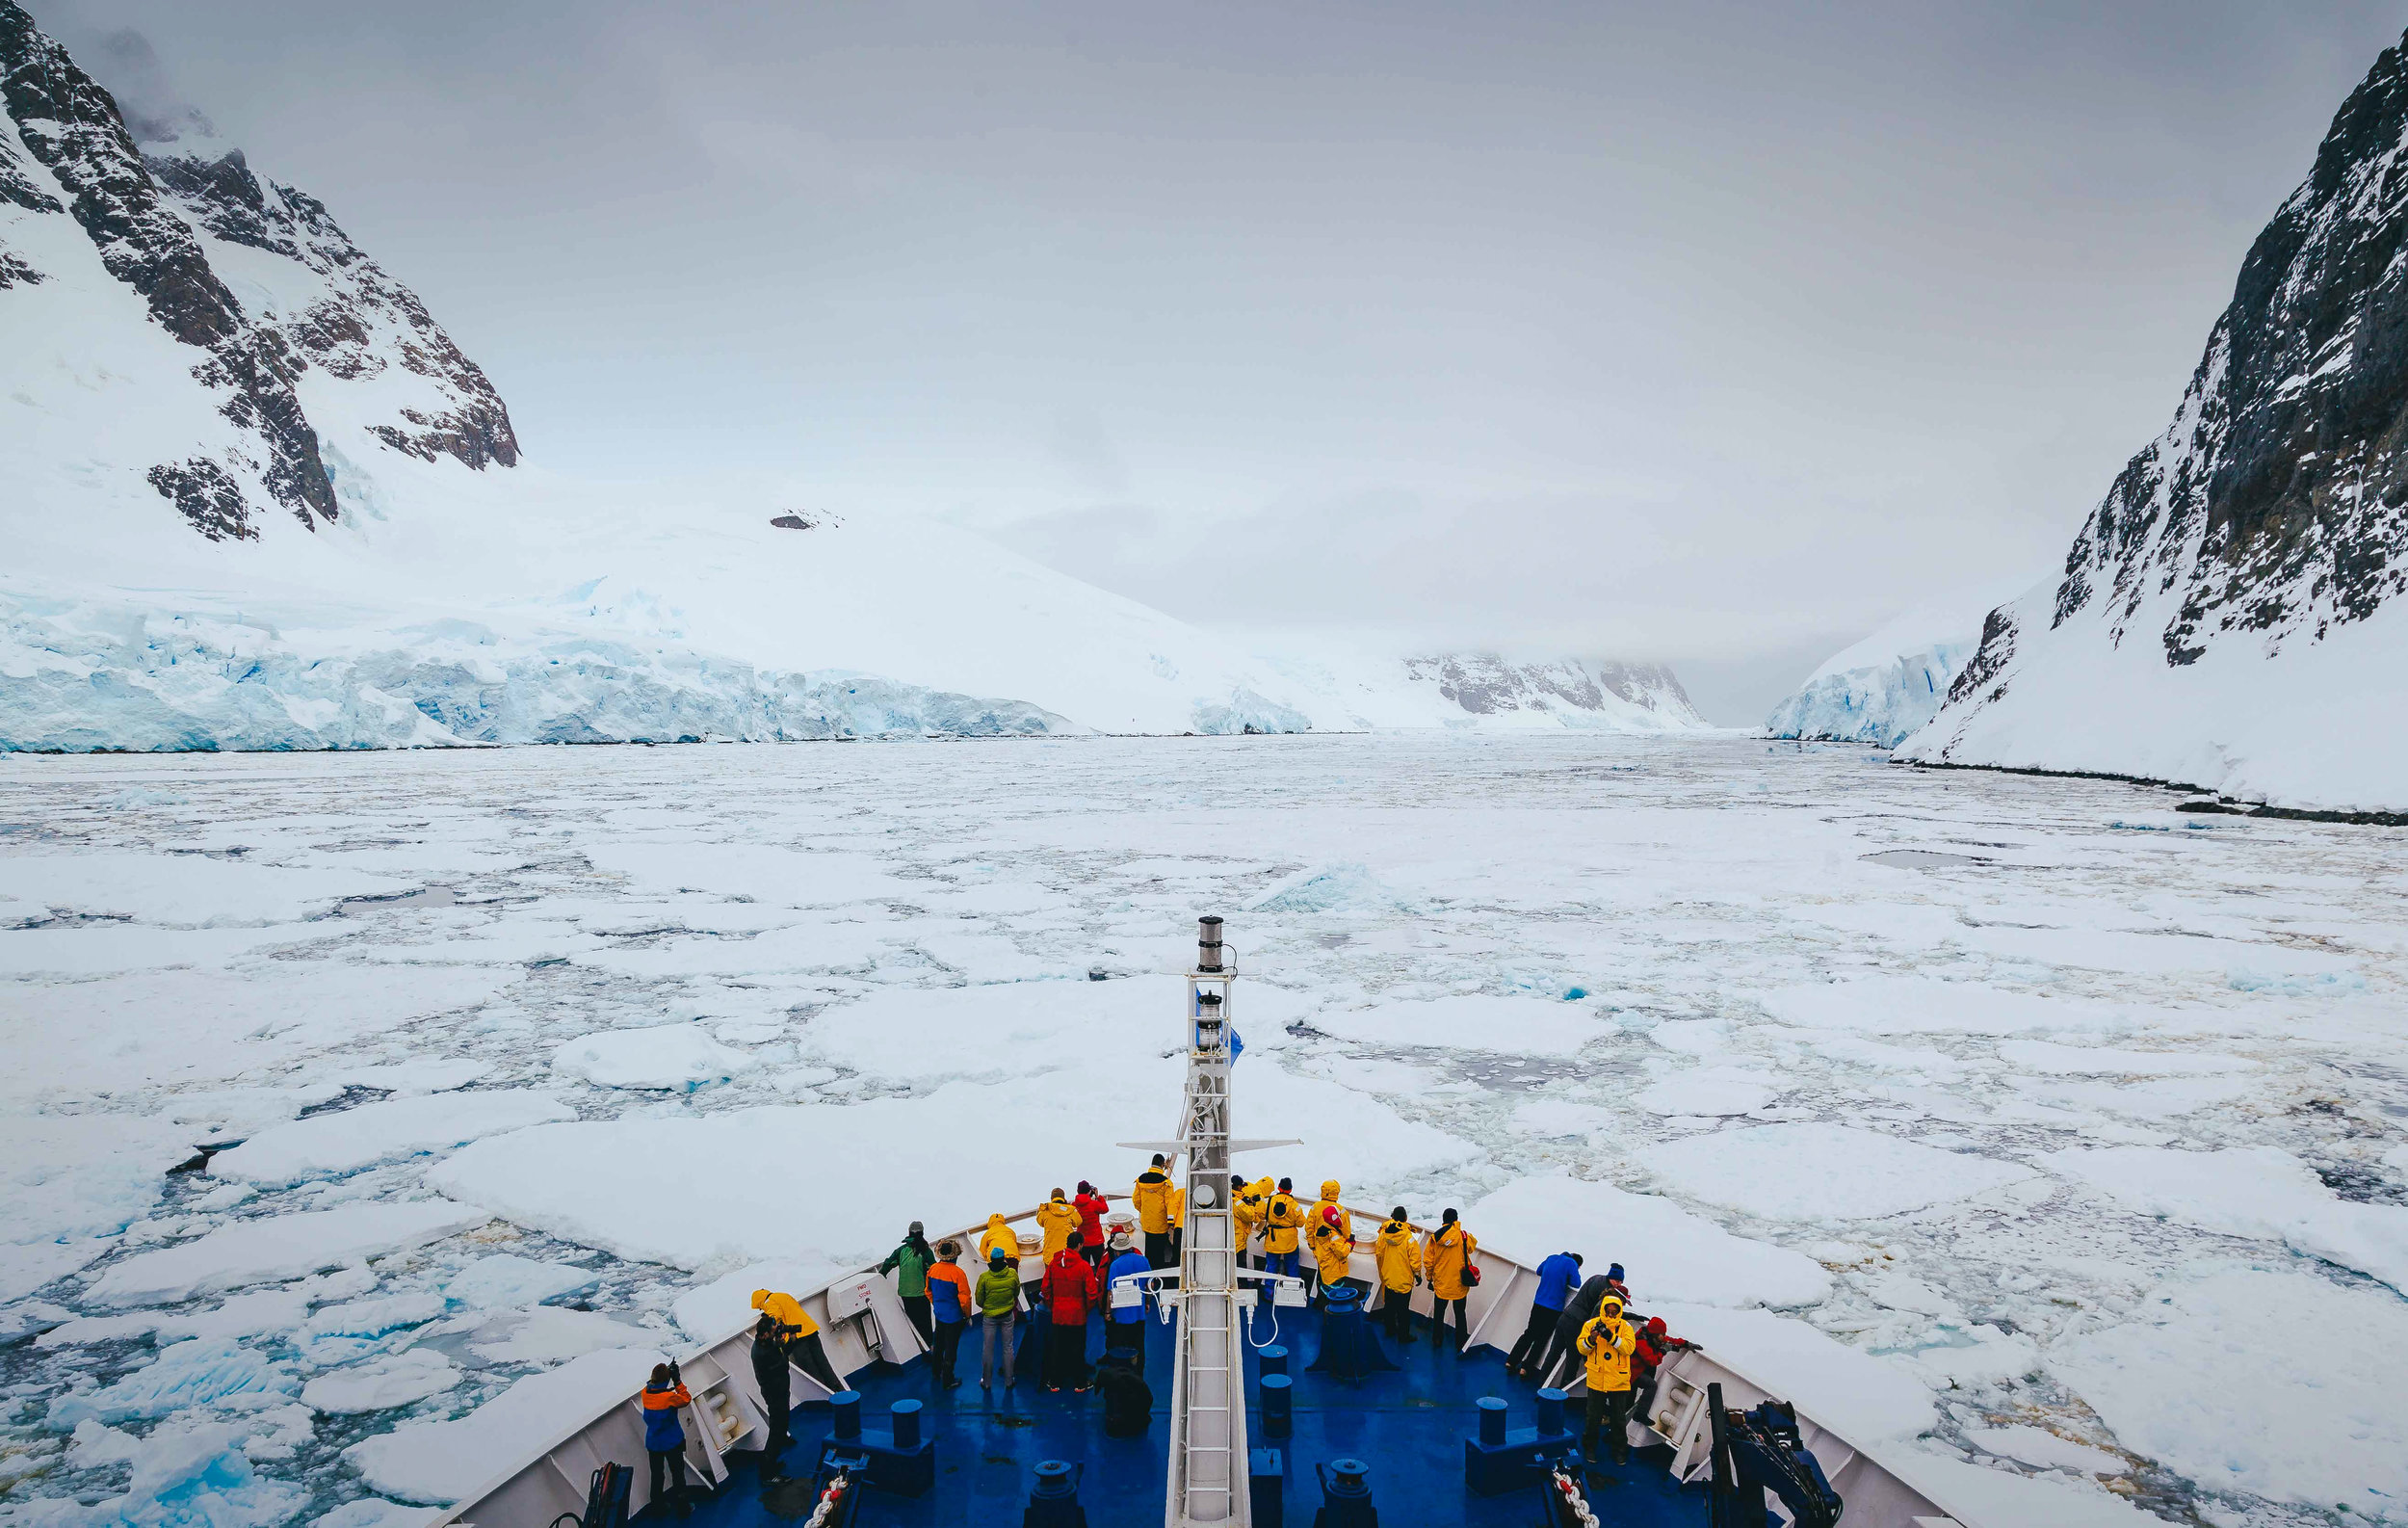 PRC photo Quark Expeditions__Epic Antarctica_Crossing the Circle via Falklands (Malvinas)  South Georgia_20141108-IMG_9913_David Merron.jpg